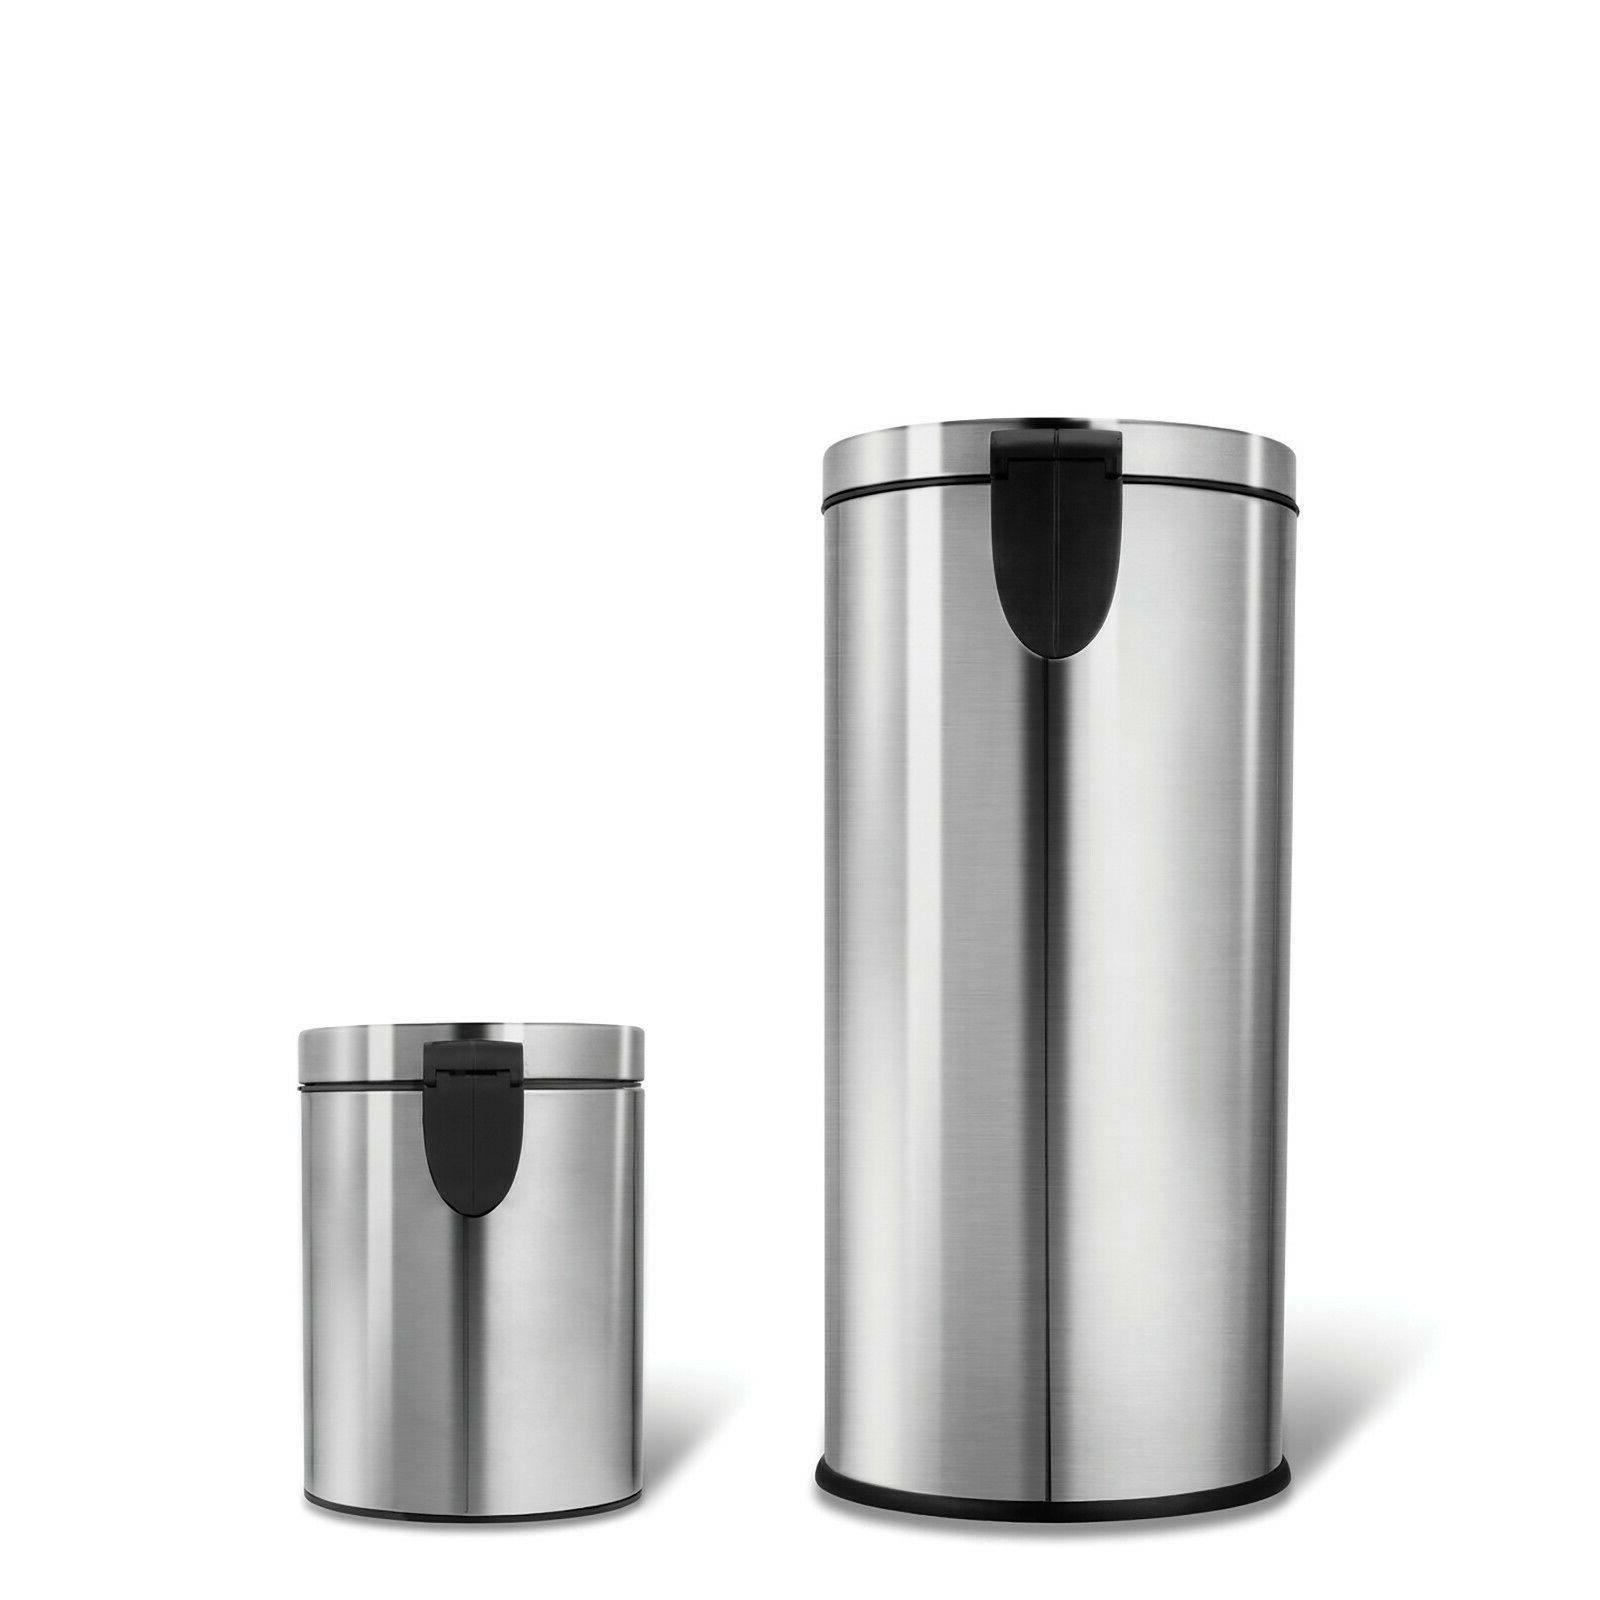 Silver 30L+5L Step Bin Garbage Waste Kitchen Bag